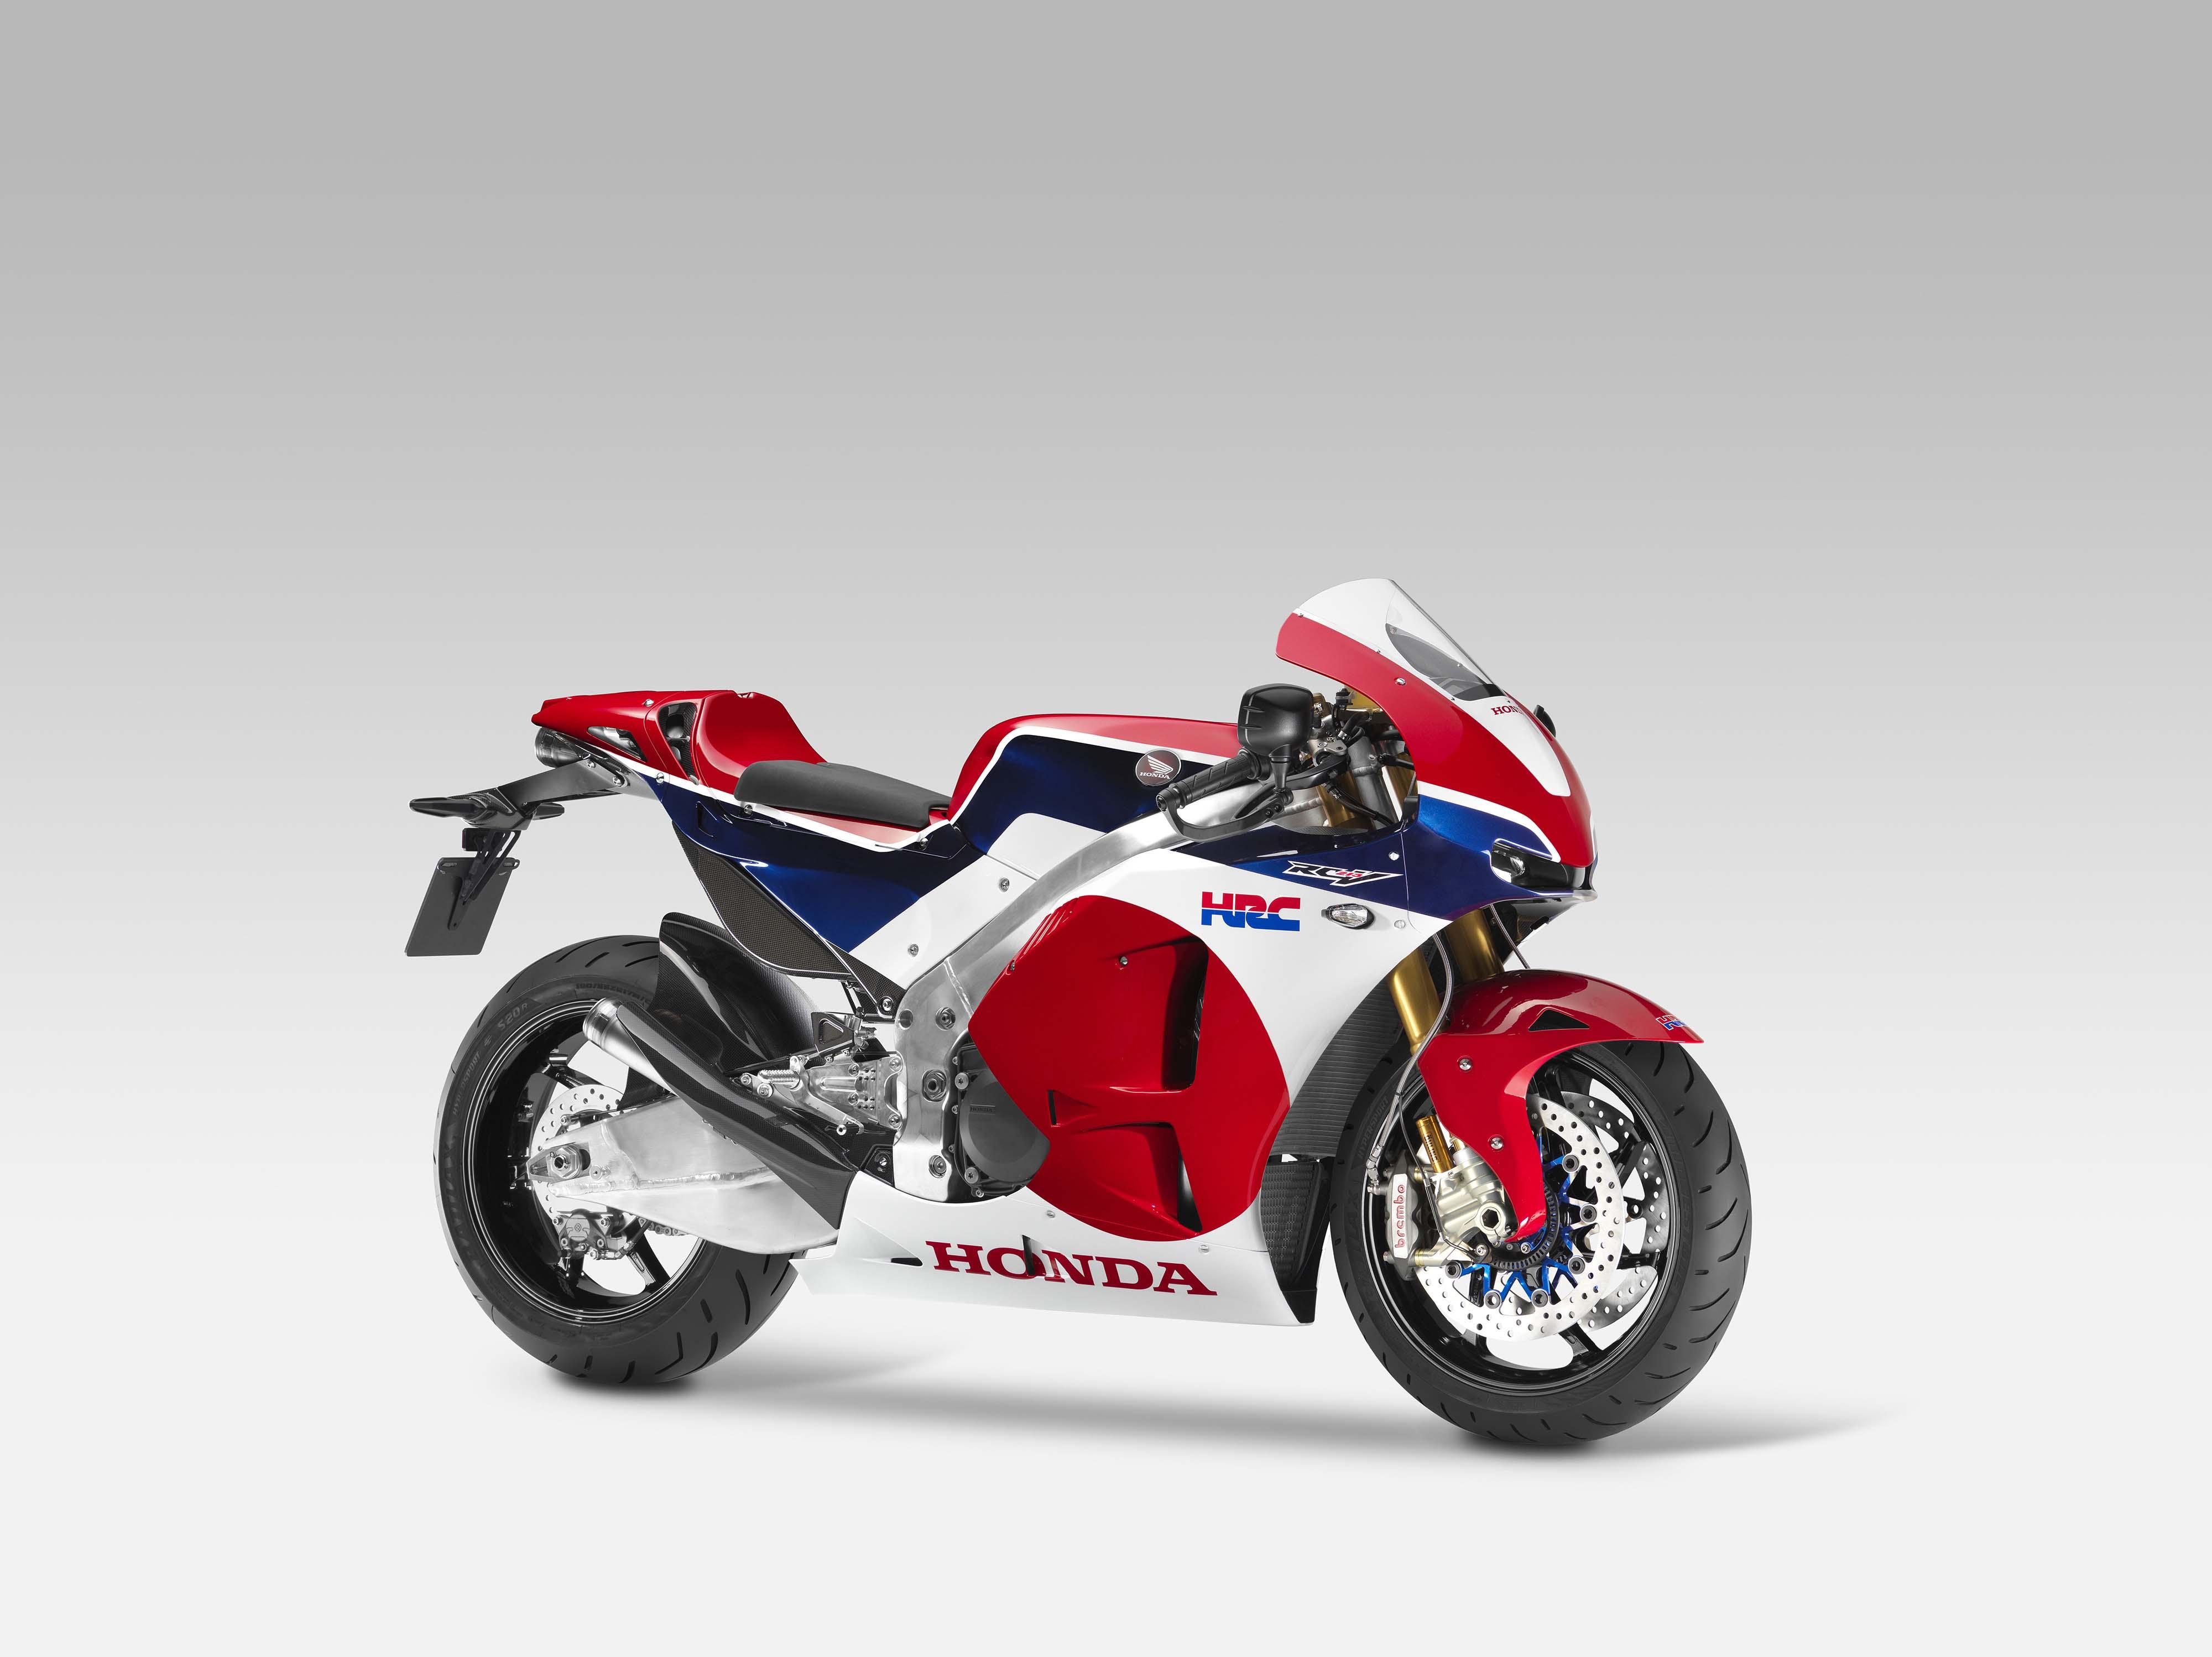 Honda RC213V-S 2015 2015-Honda-RC213V-S-prototype-01